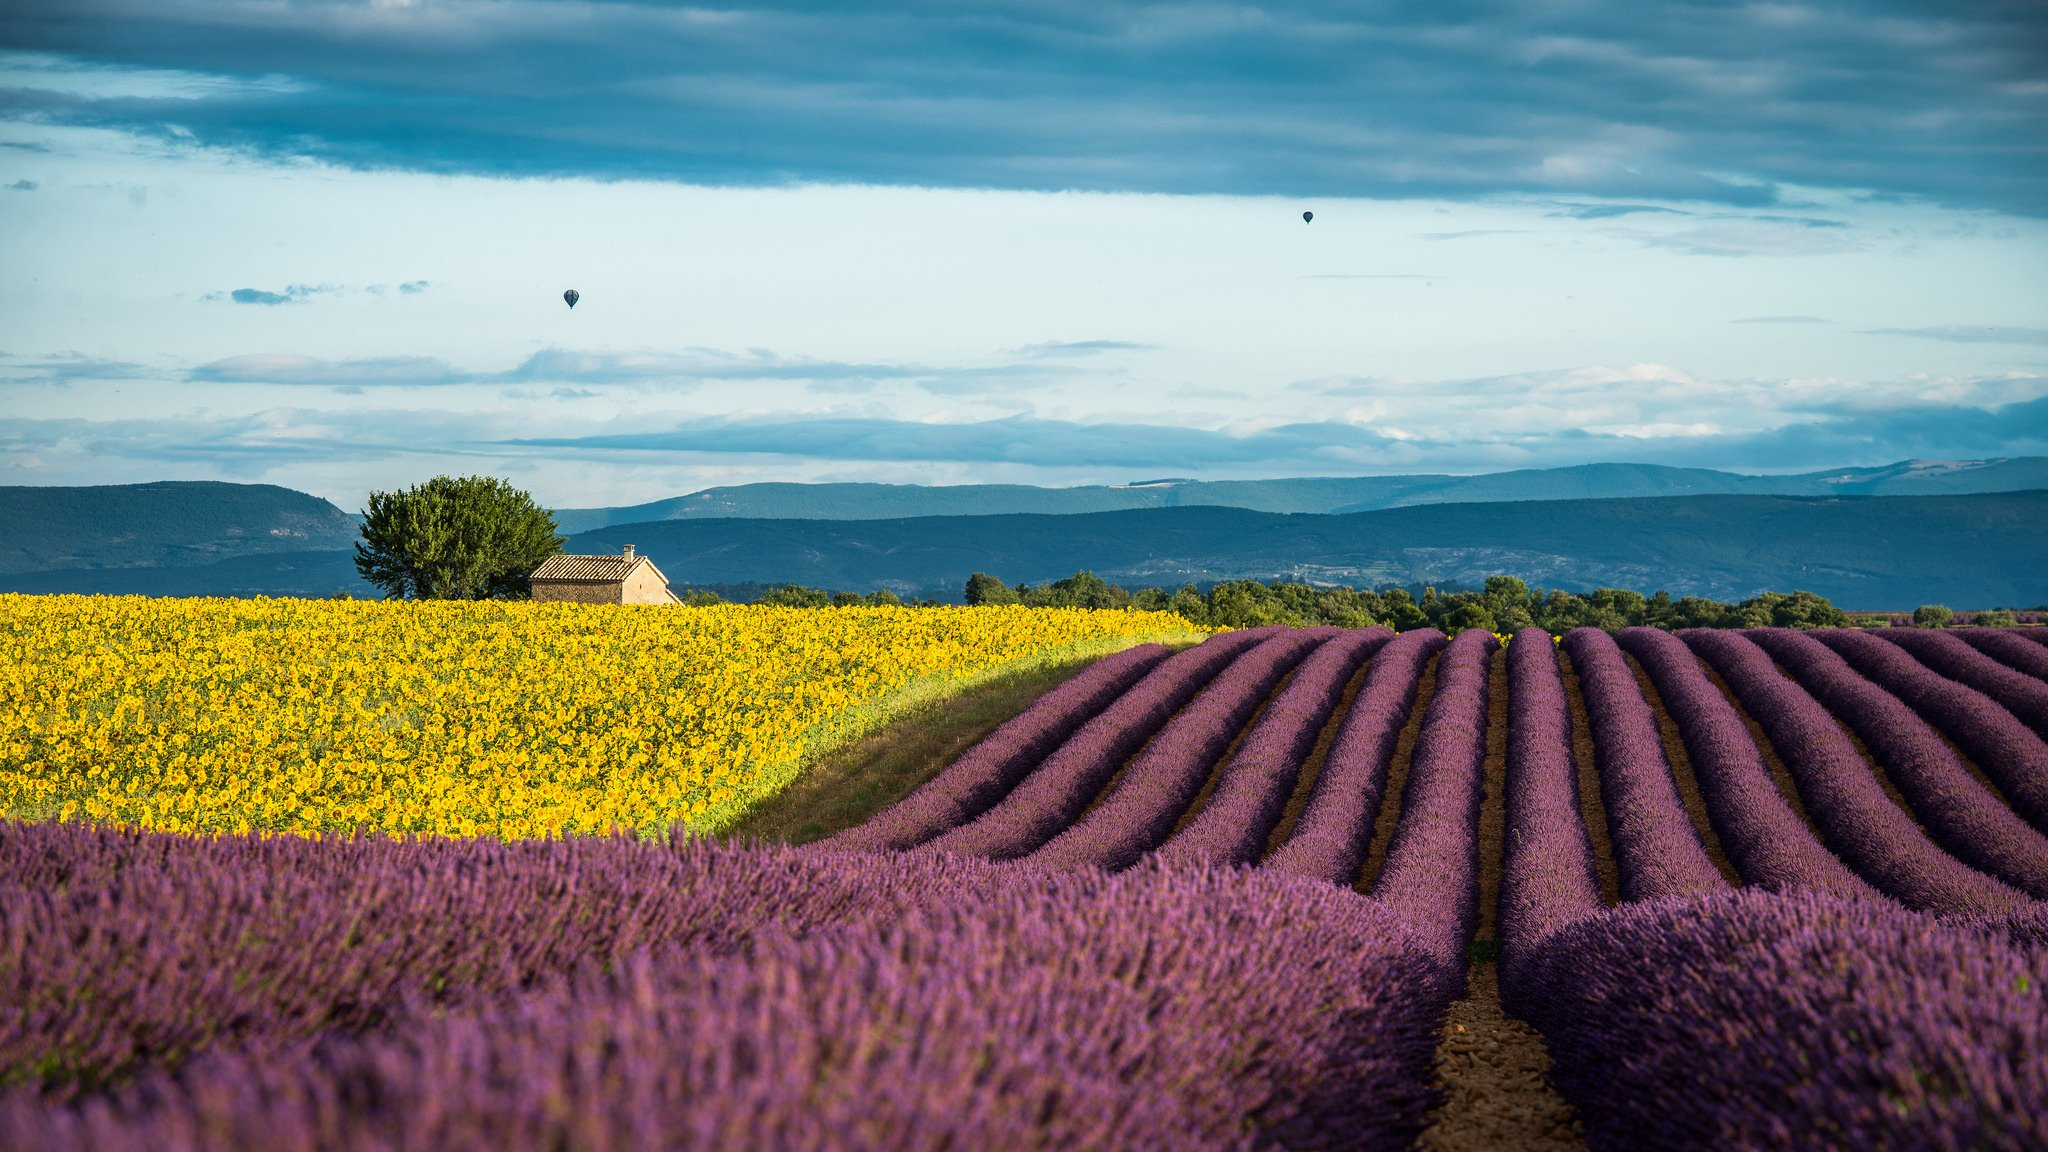 Lavender France Provence field wallpaper 2048x1152 636022 2048x1152